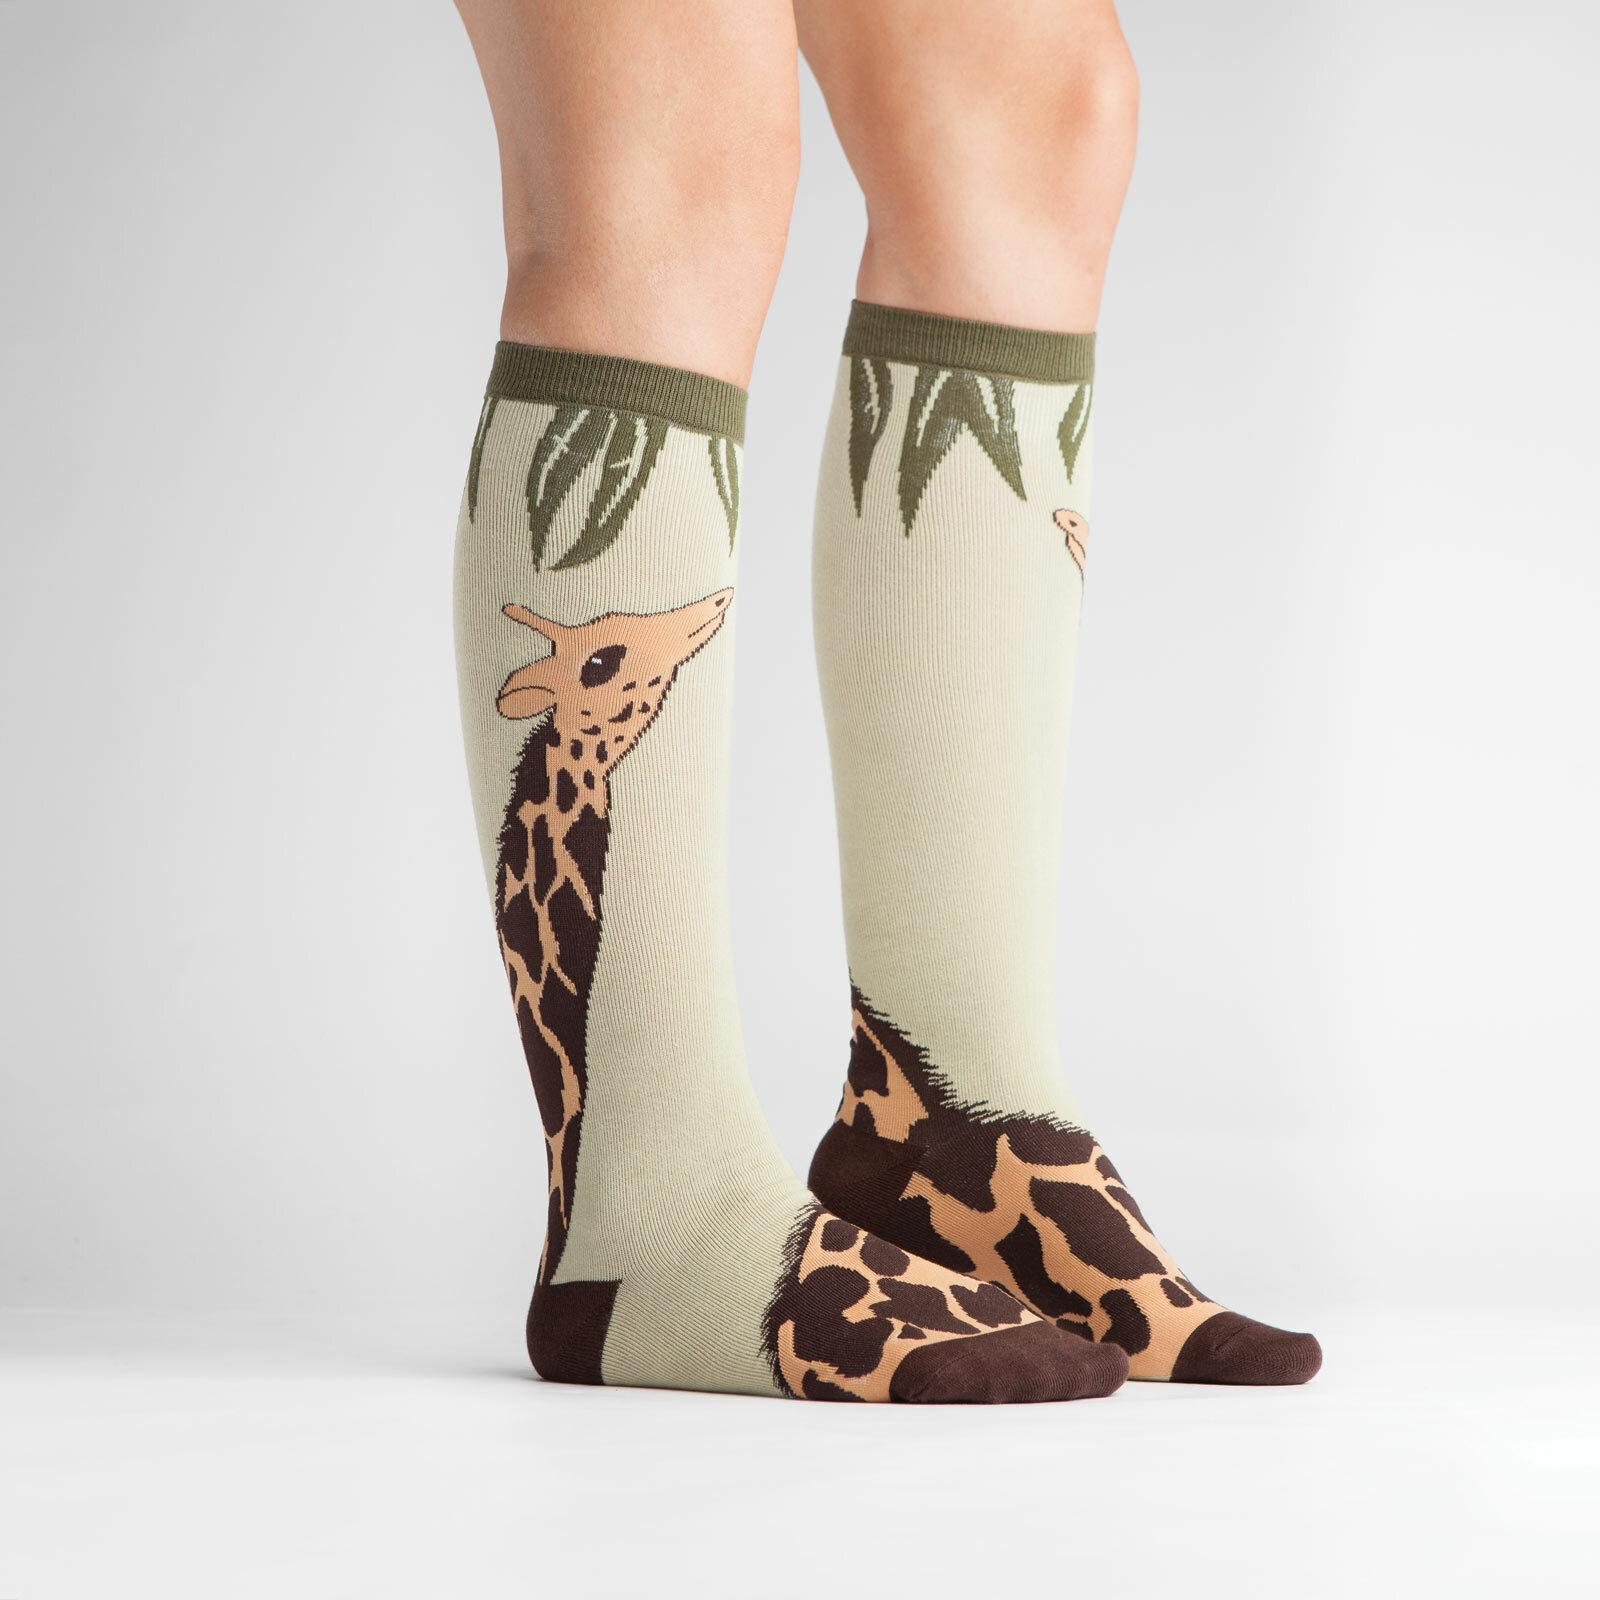 model side view of Giraffe Knee High Socks Brown and Green - Women's